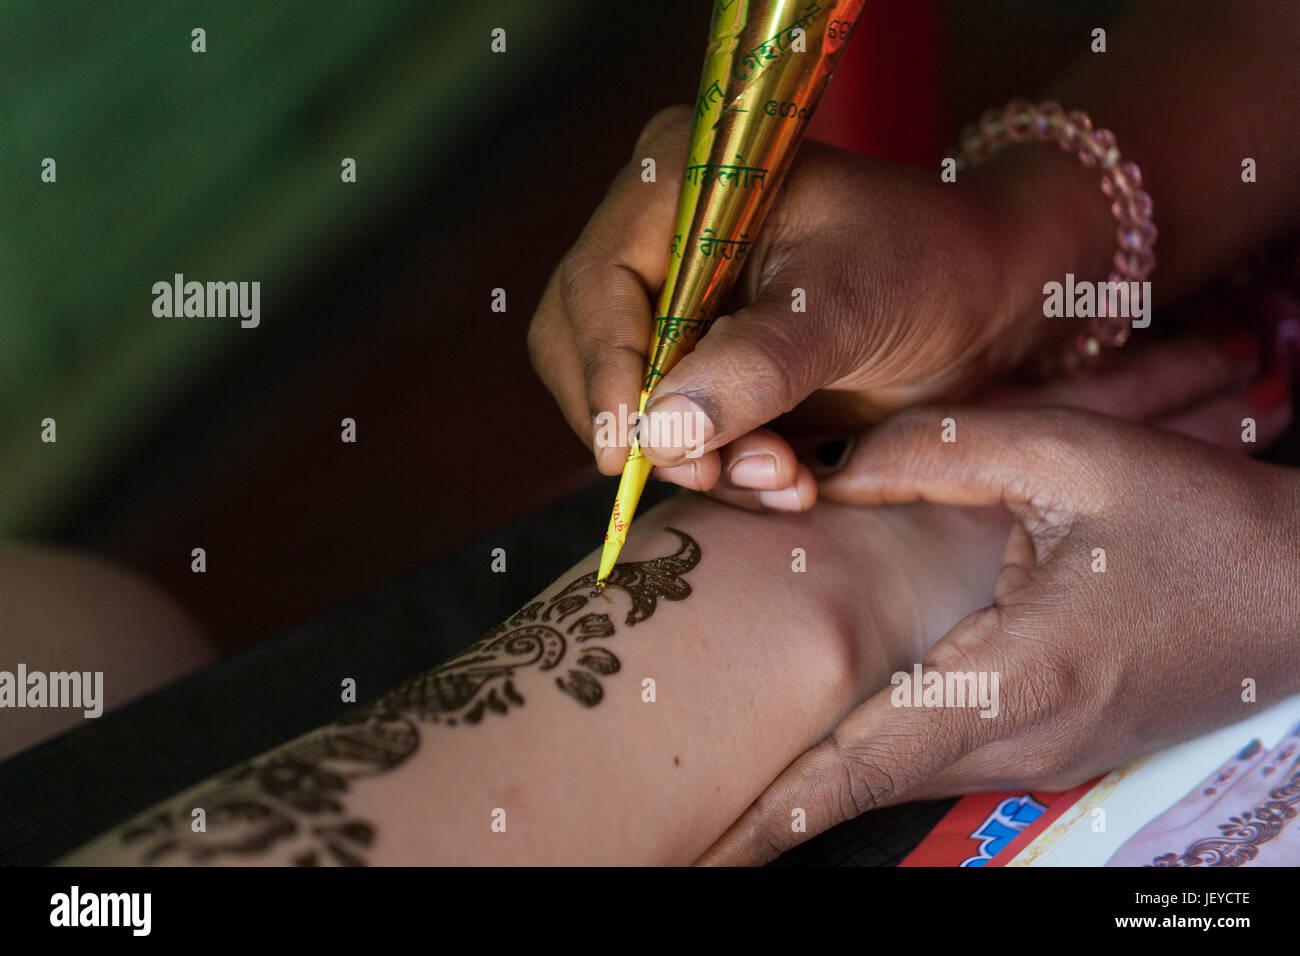 Indian Henna Tattoo Artwork Stock Photos Indian Henna Tattoo